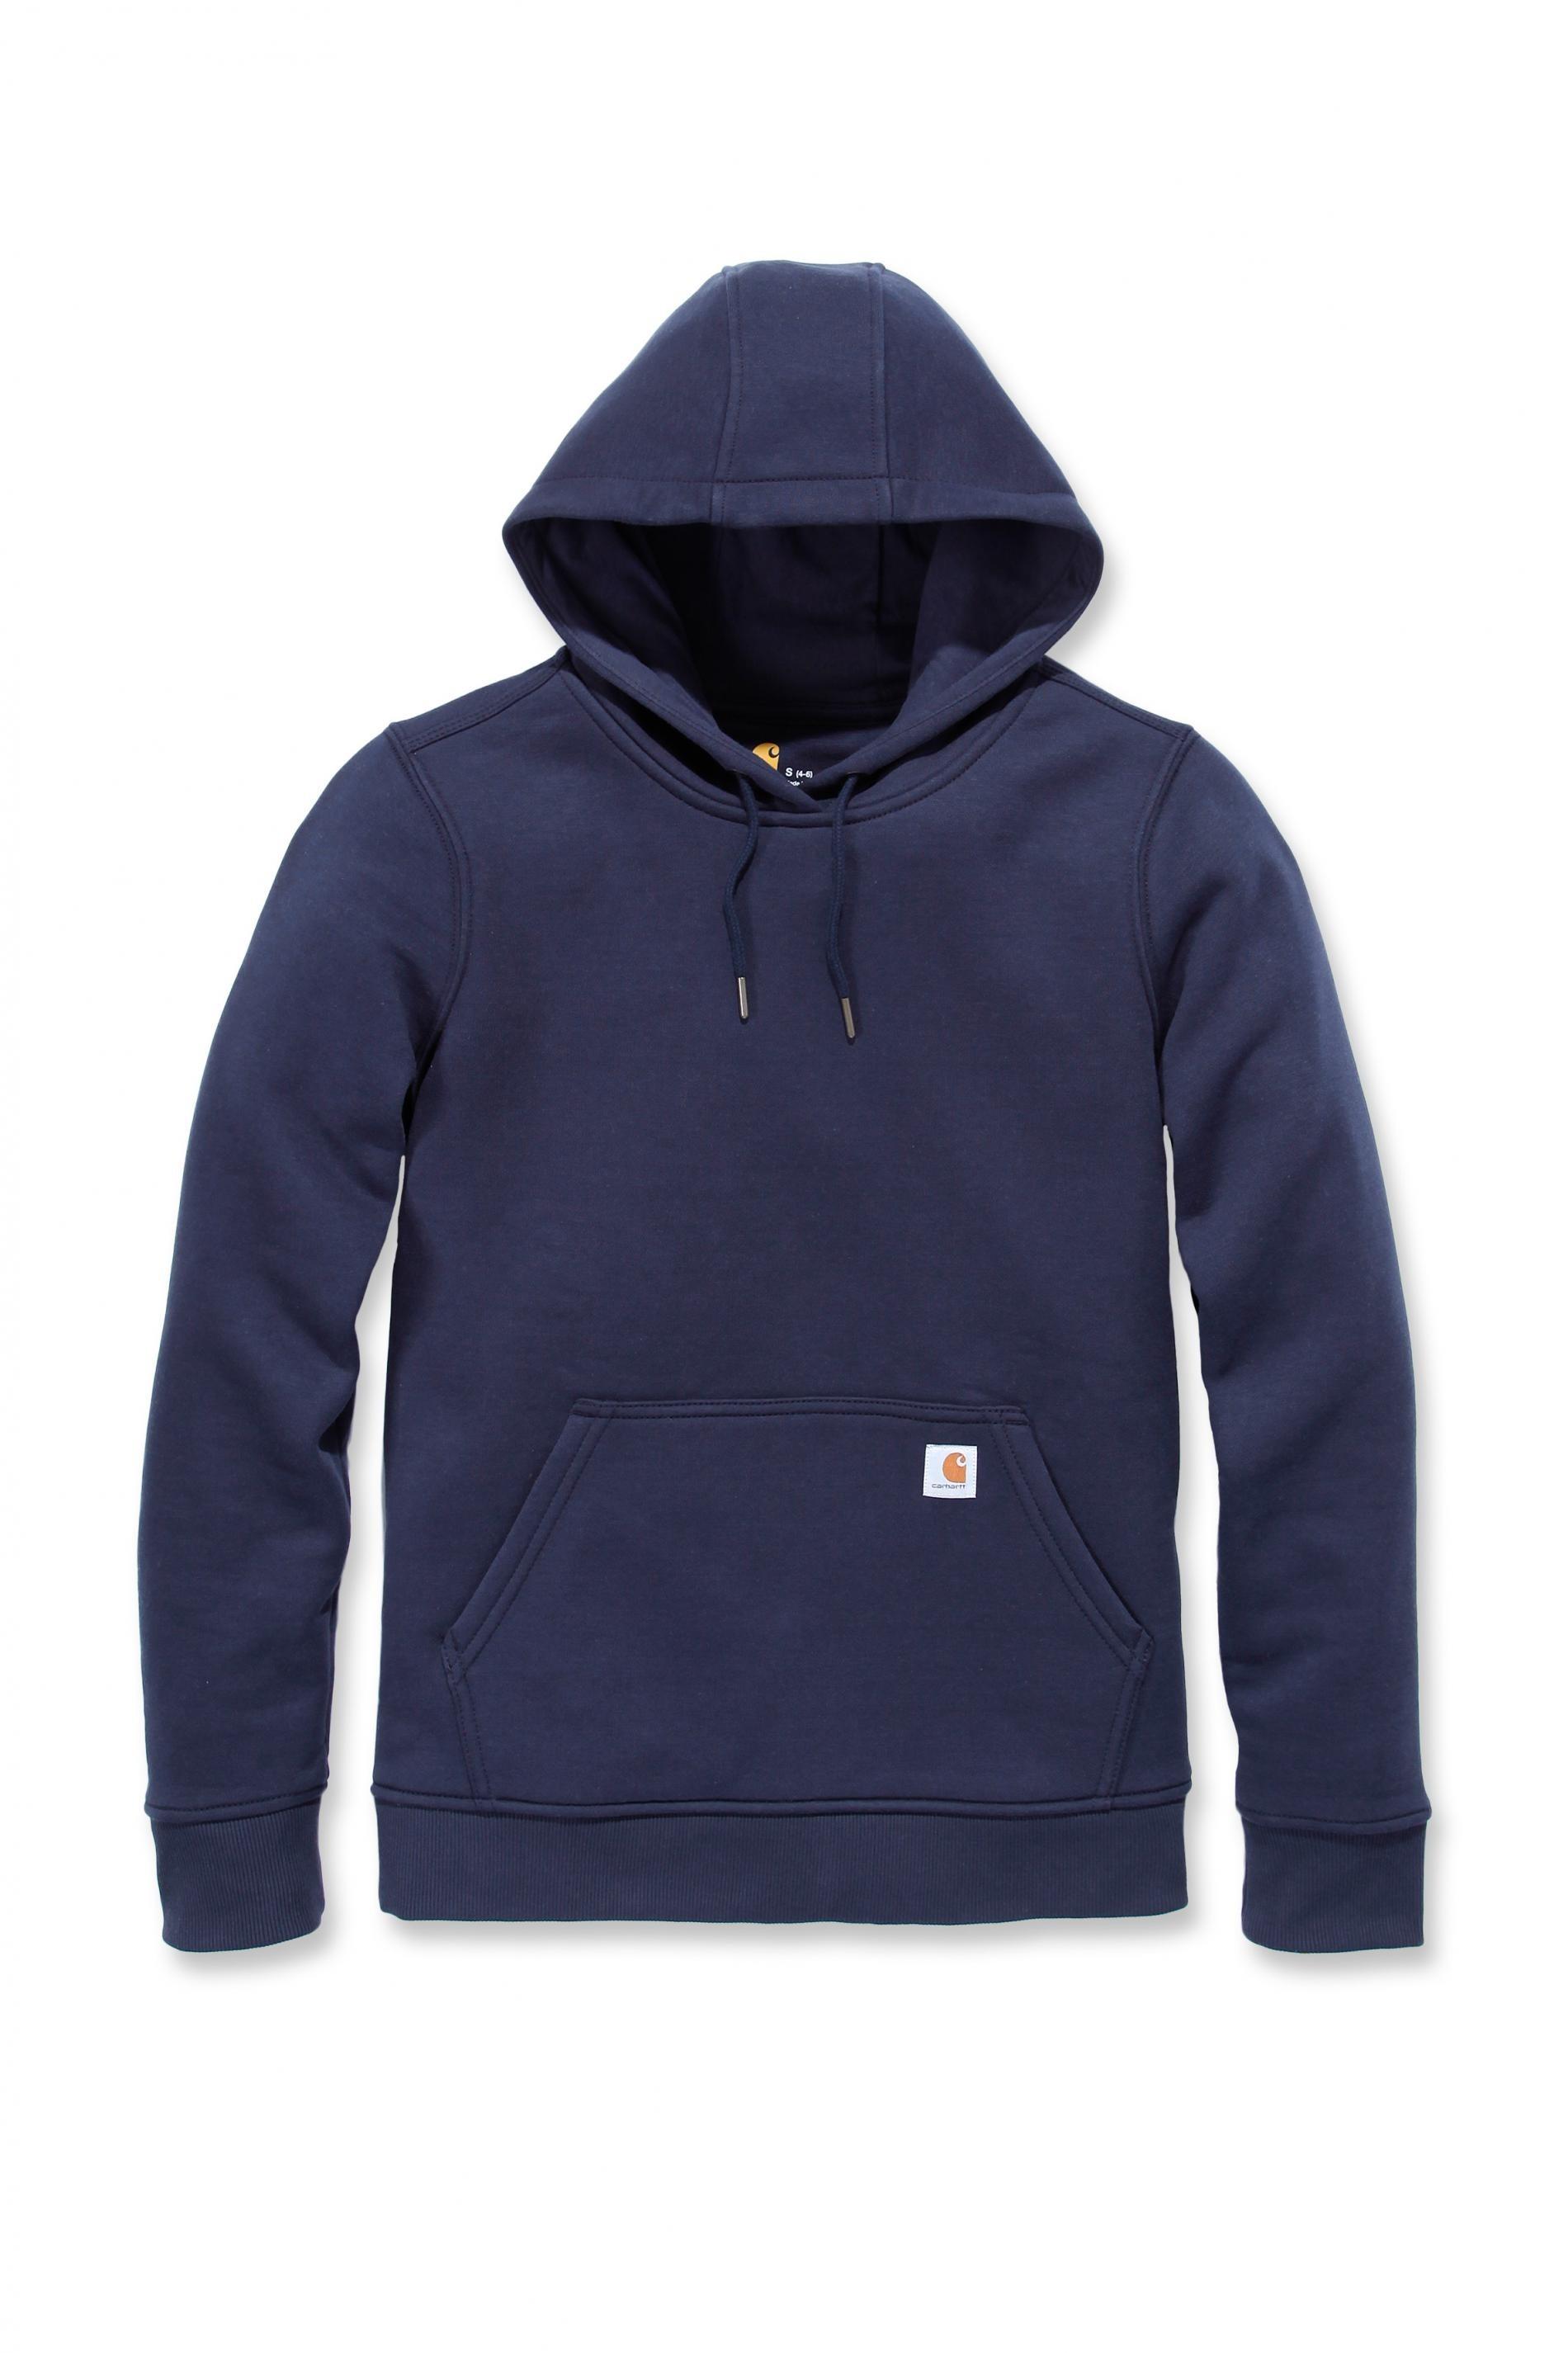 Carhartt Womens Pullover Sweatshirt Hoody: Navy